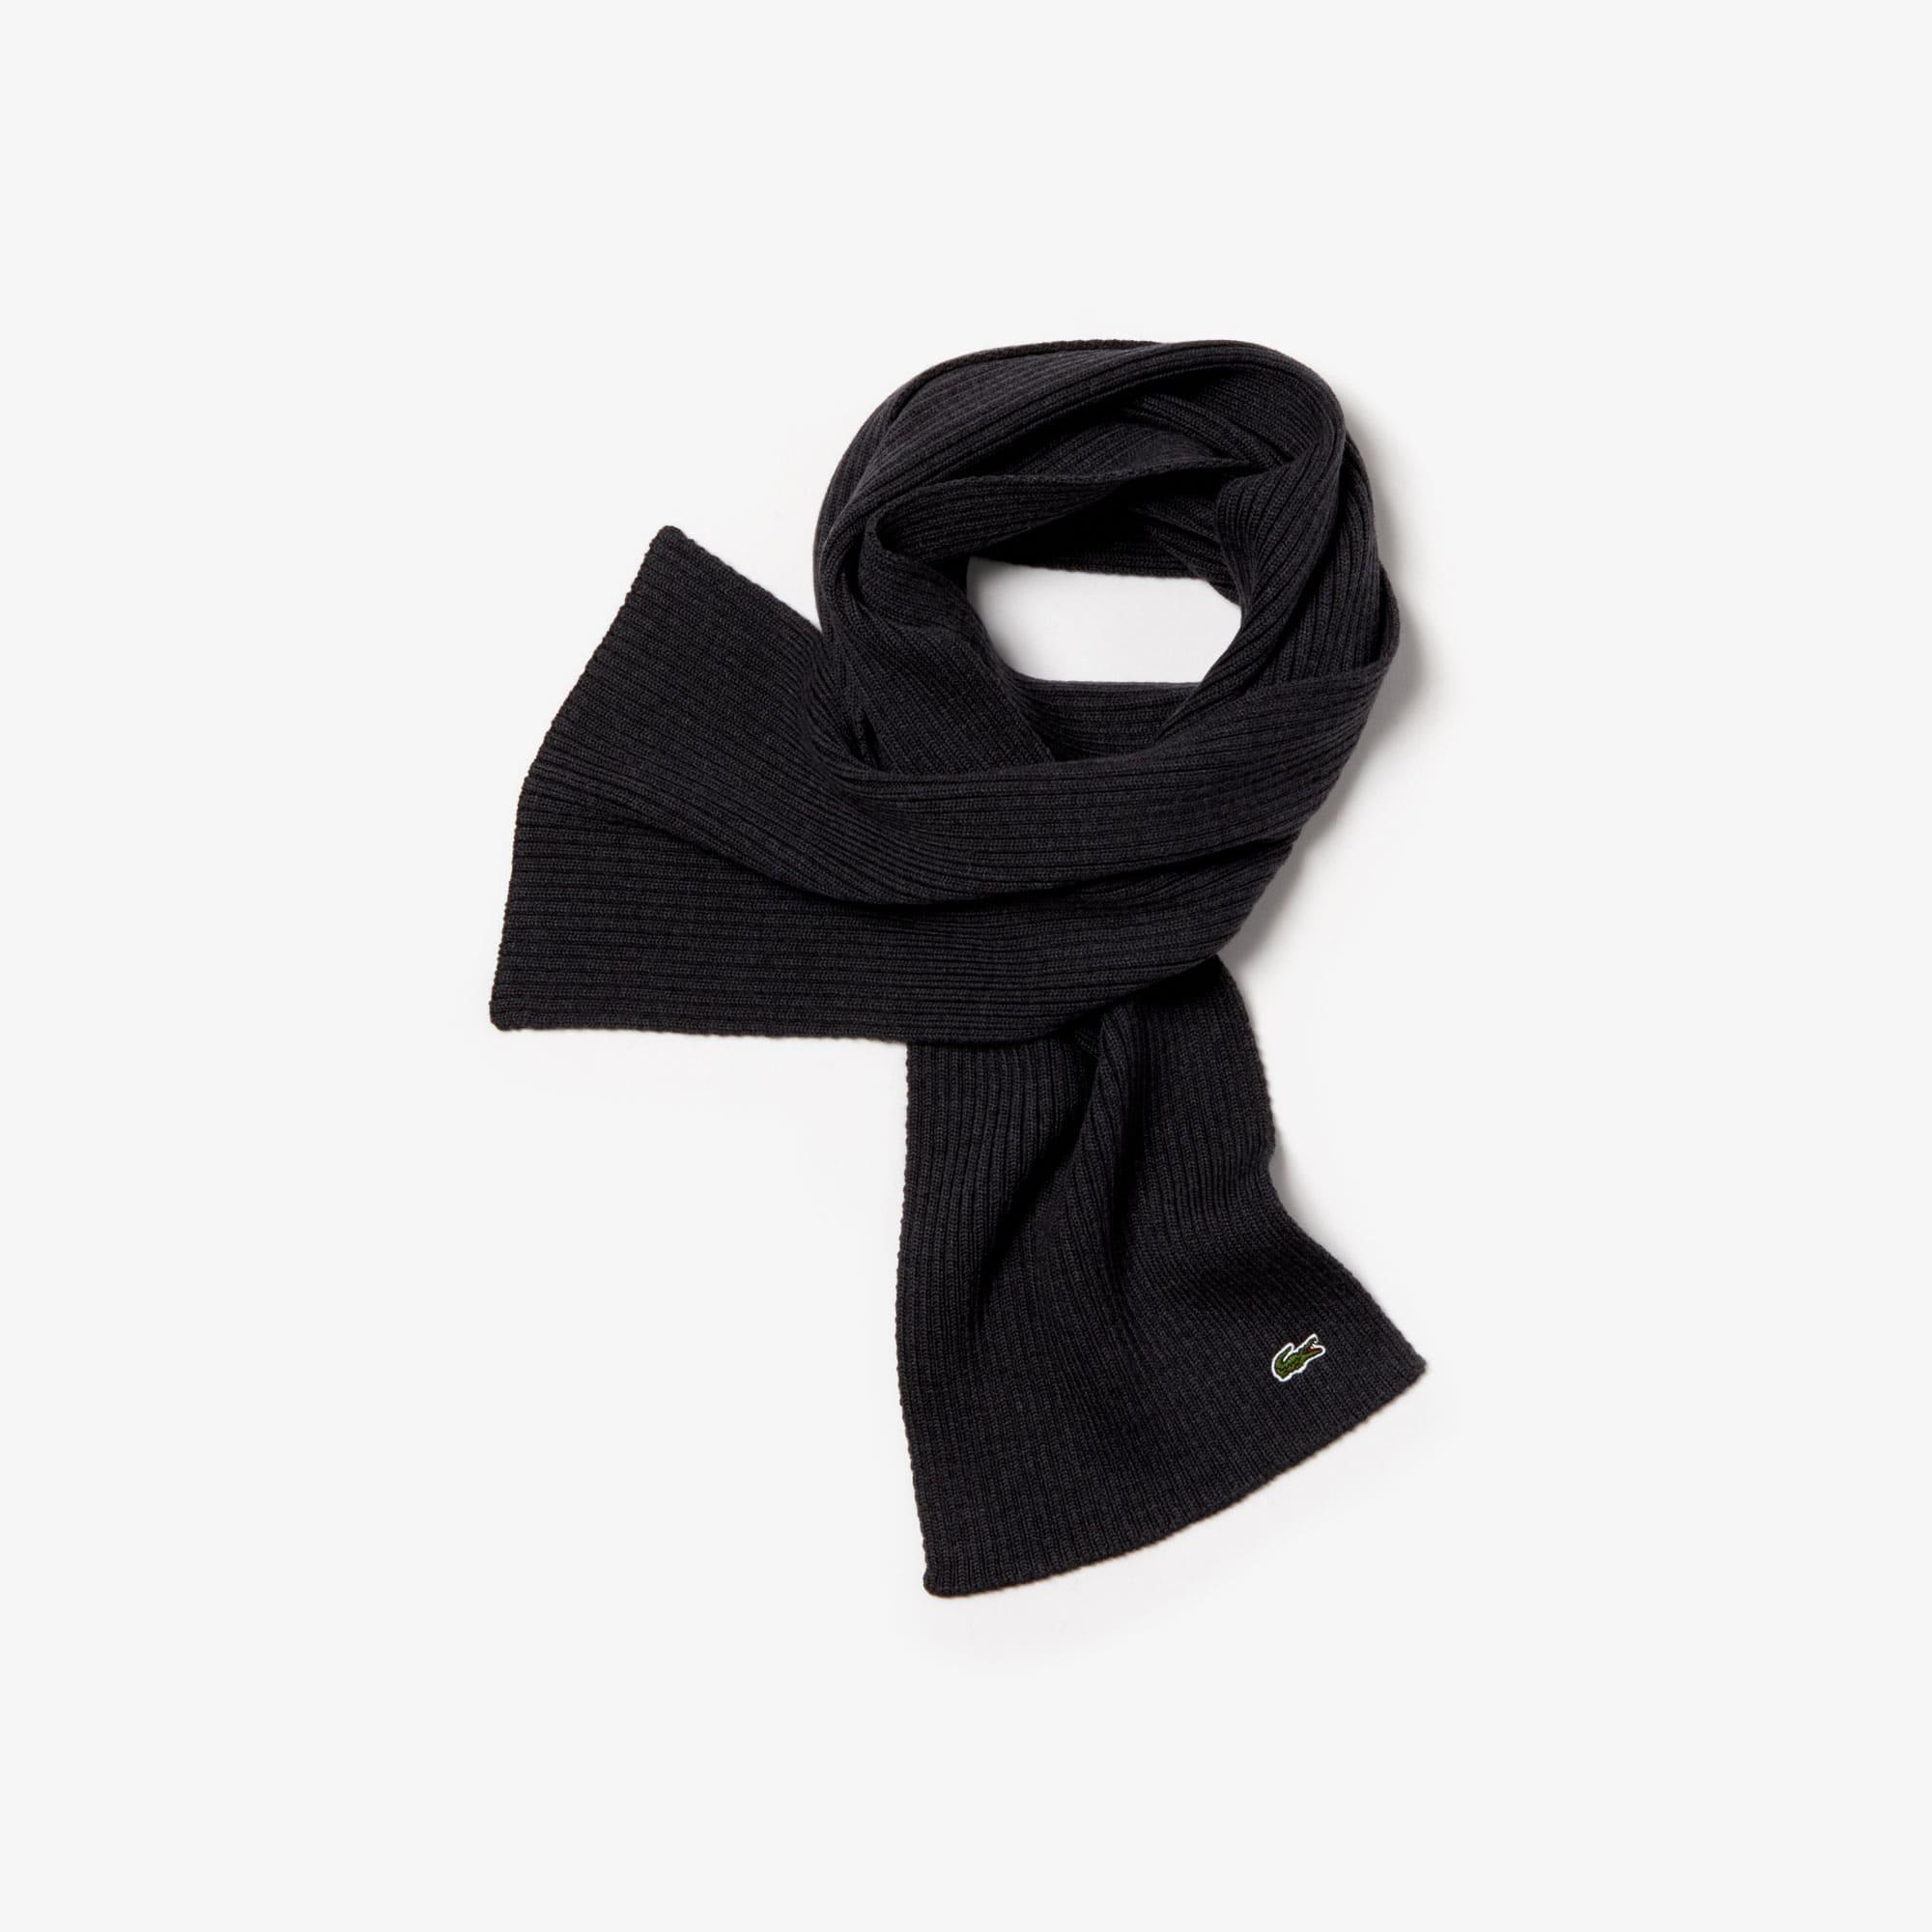 00117a54240bec Scarves & Gloves | Men's Accessories | LACOSTE